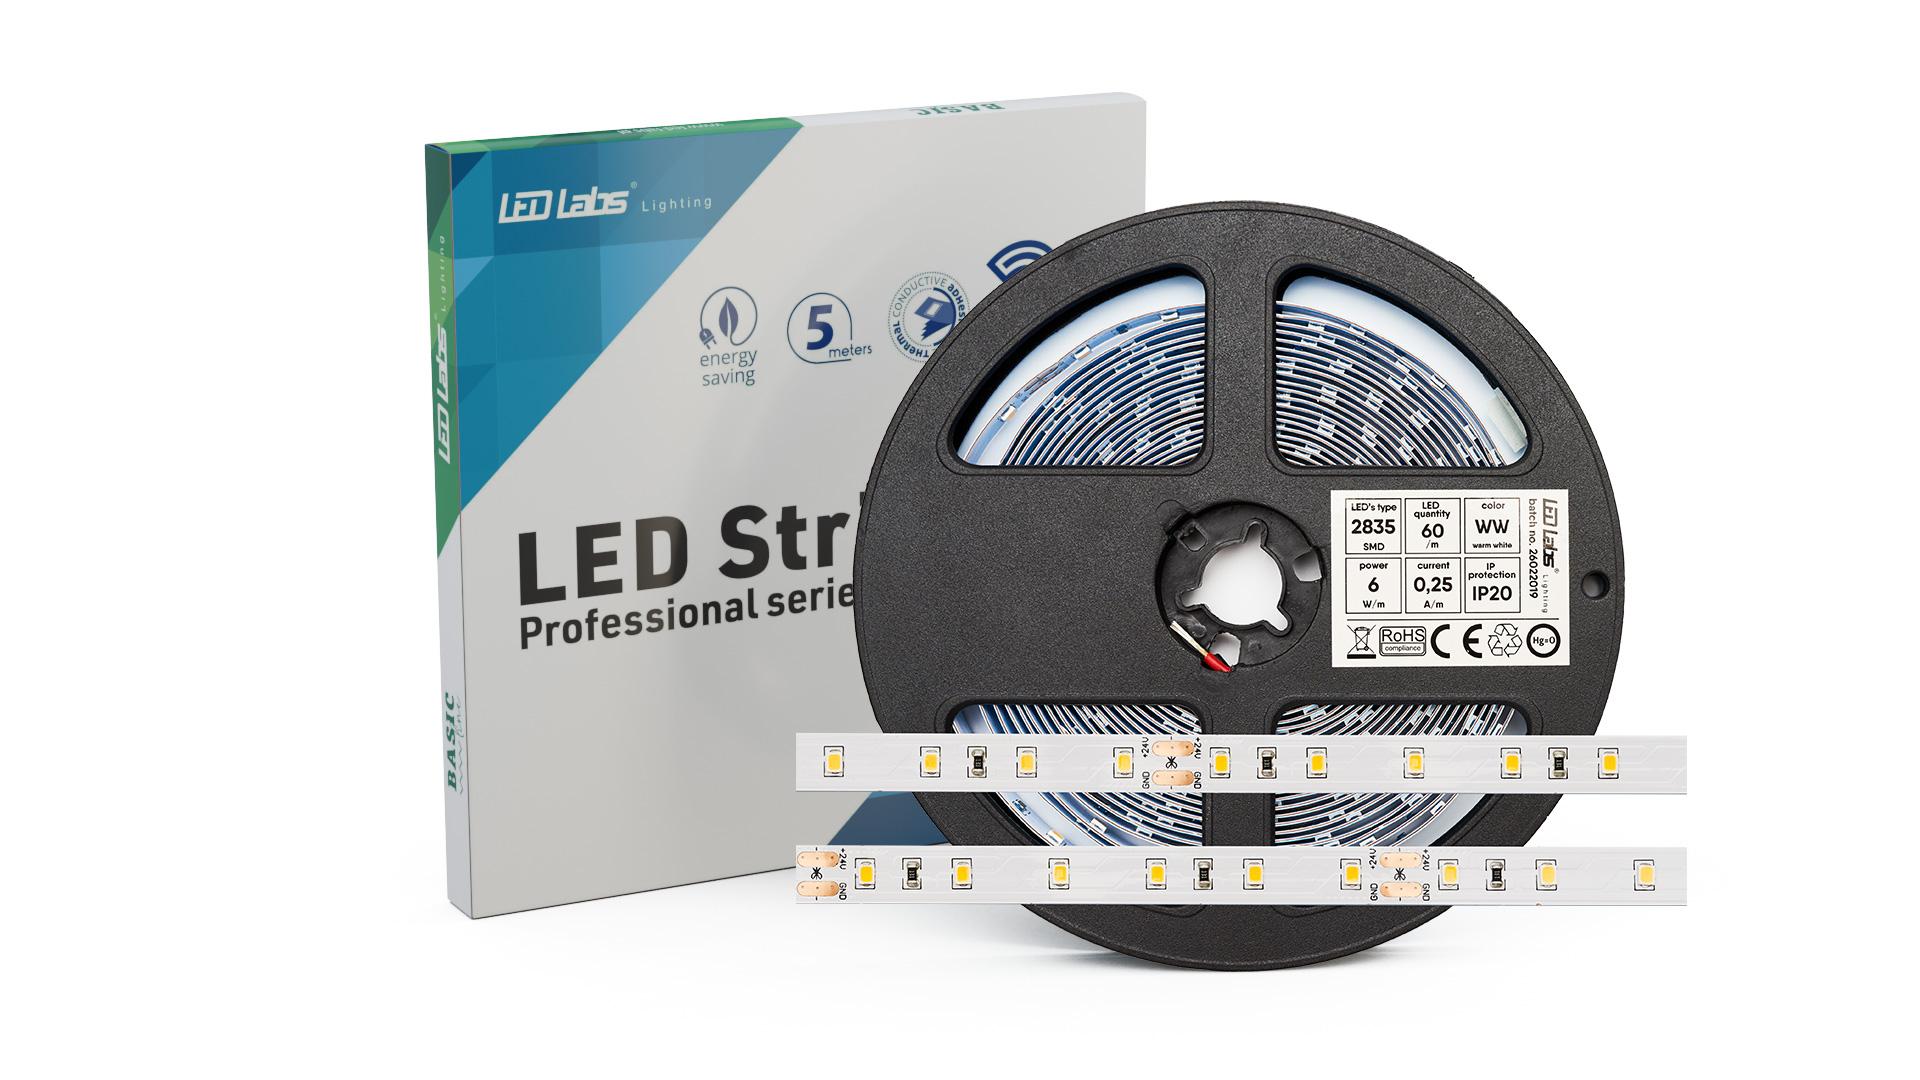 LED Strip PRO 3YB 12V 300 LED 2835 SMD 6W, Cold white IP65HS